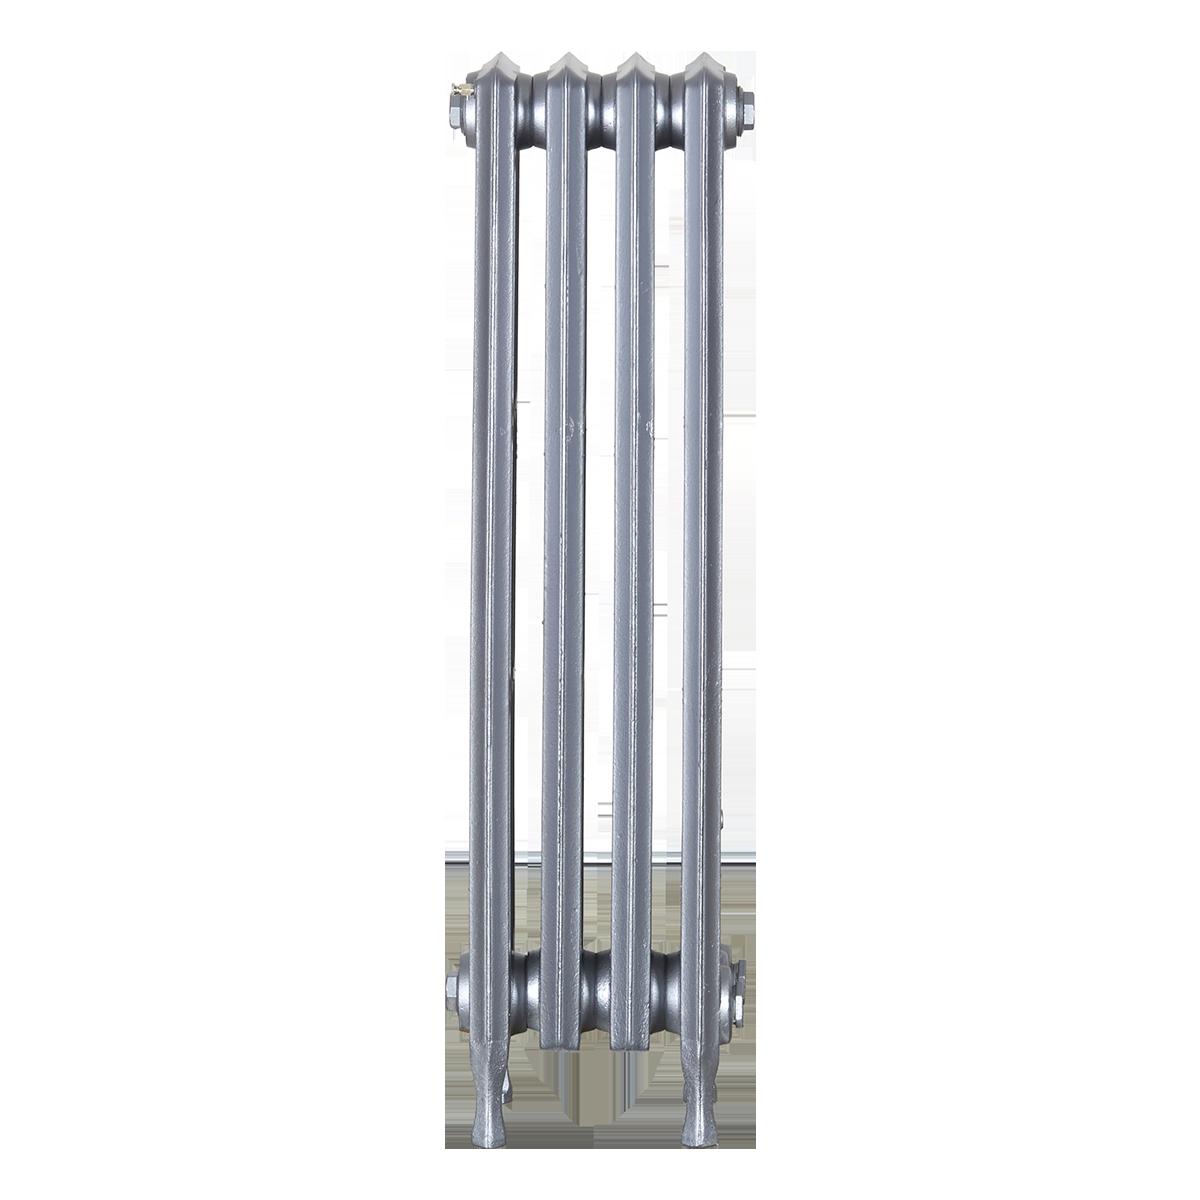 Ironworks Radiators Inc. refurbished cast iron radiator Scottfield in Pewter metallic